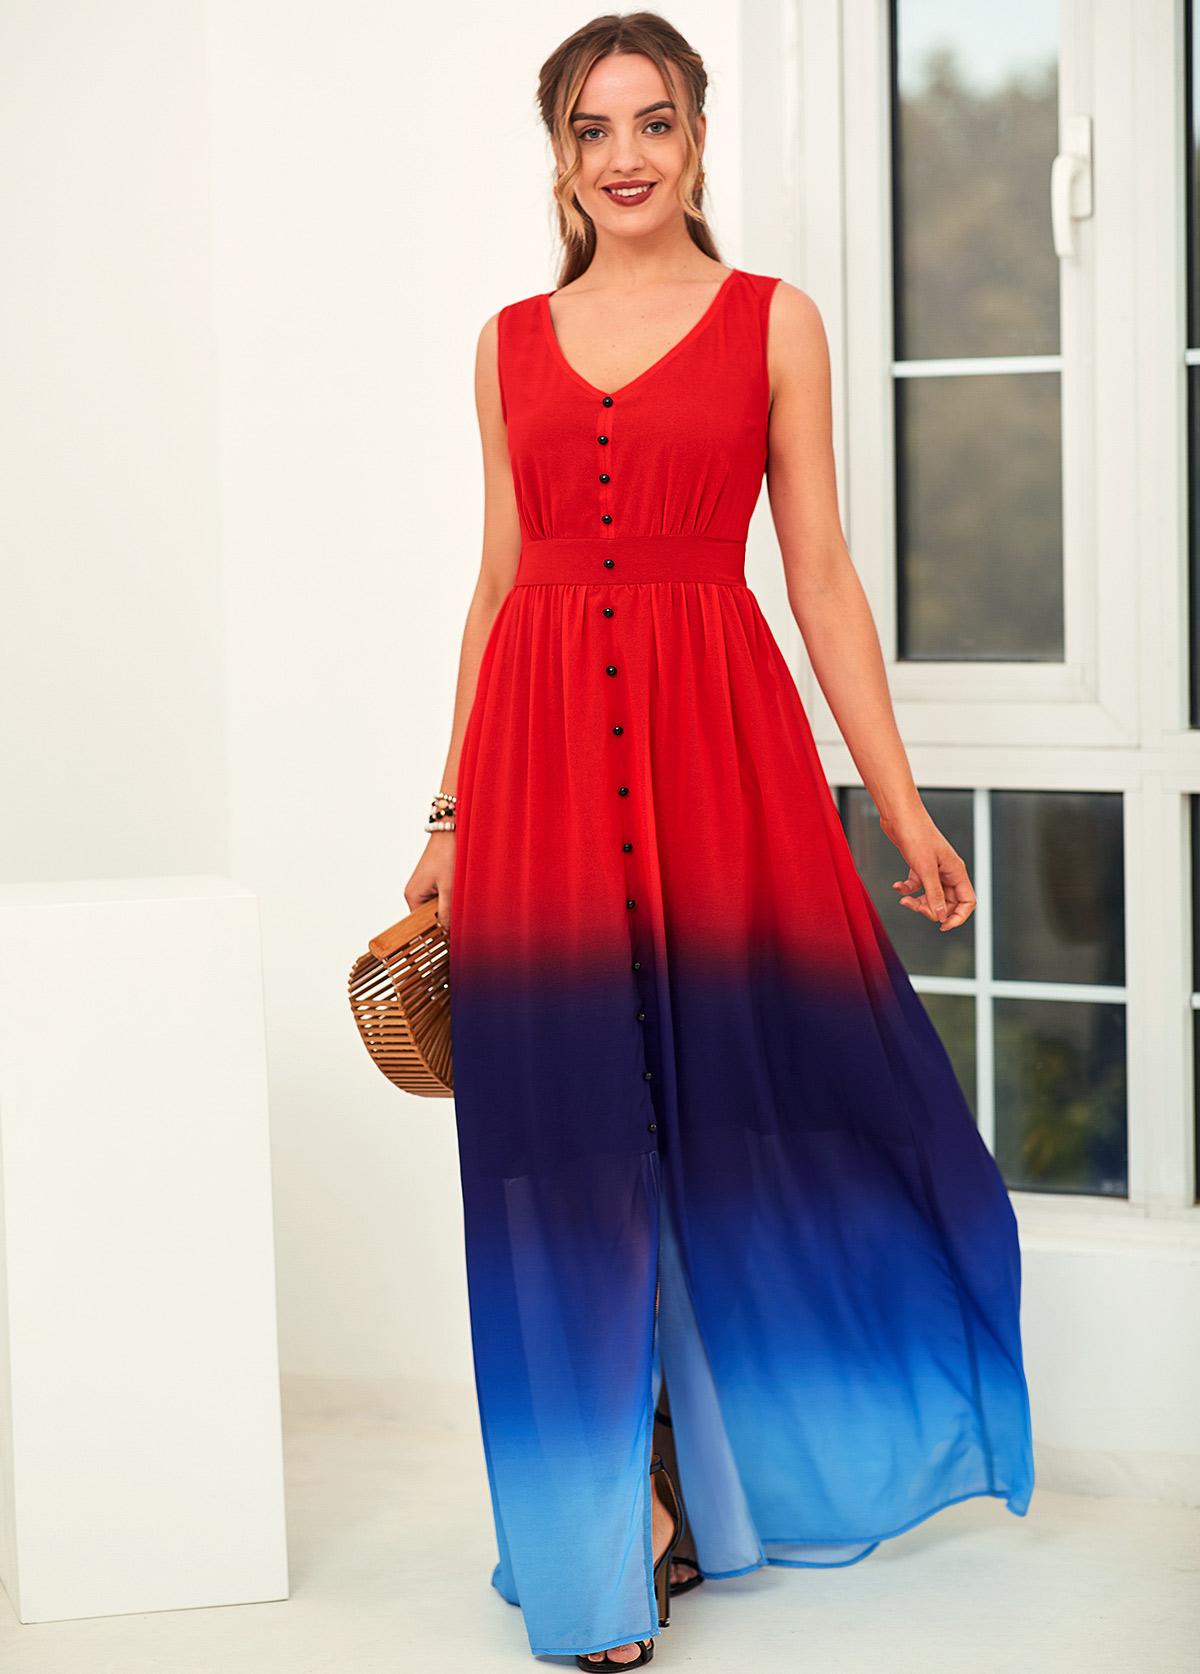 Ombre V Neck Sleeveless High Waist Dress